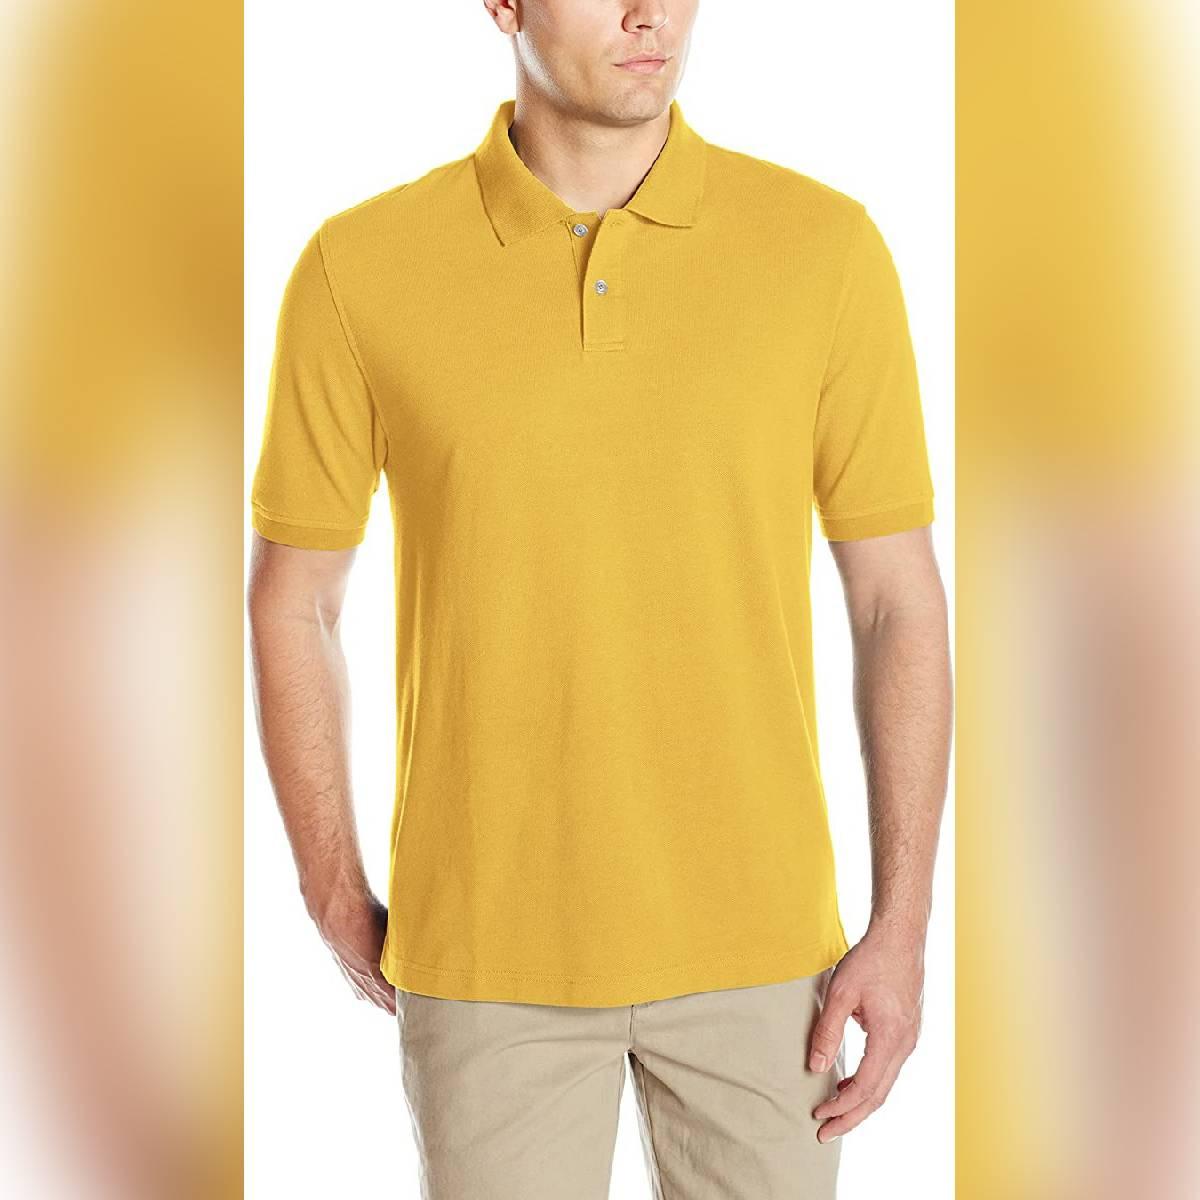 Anace Yellow 100% Cotton Polo Shirt for Men's